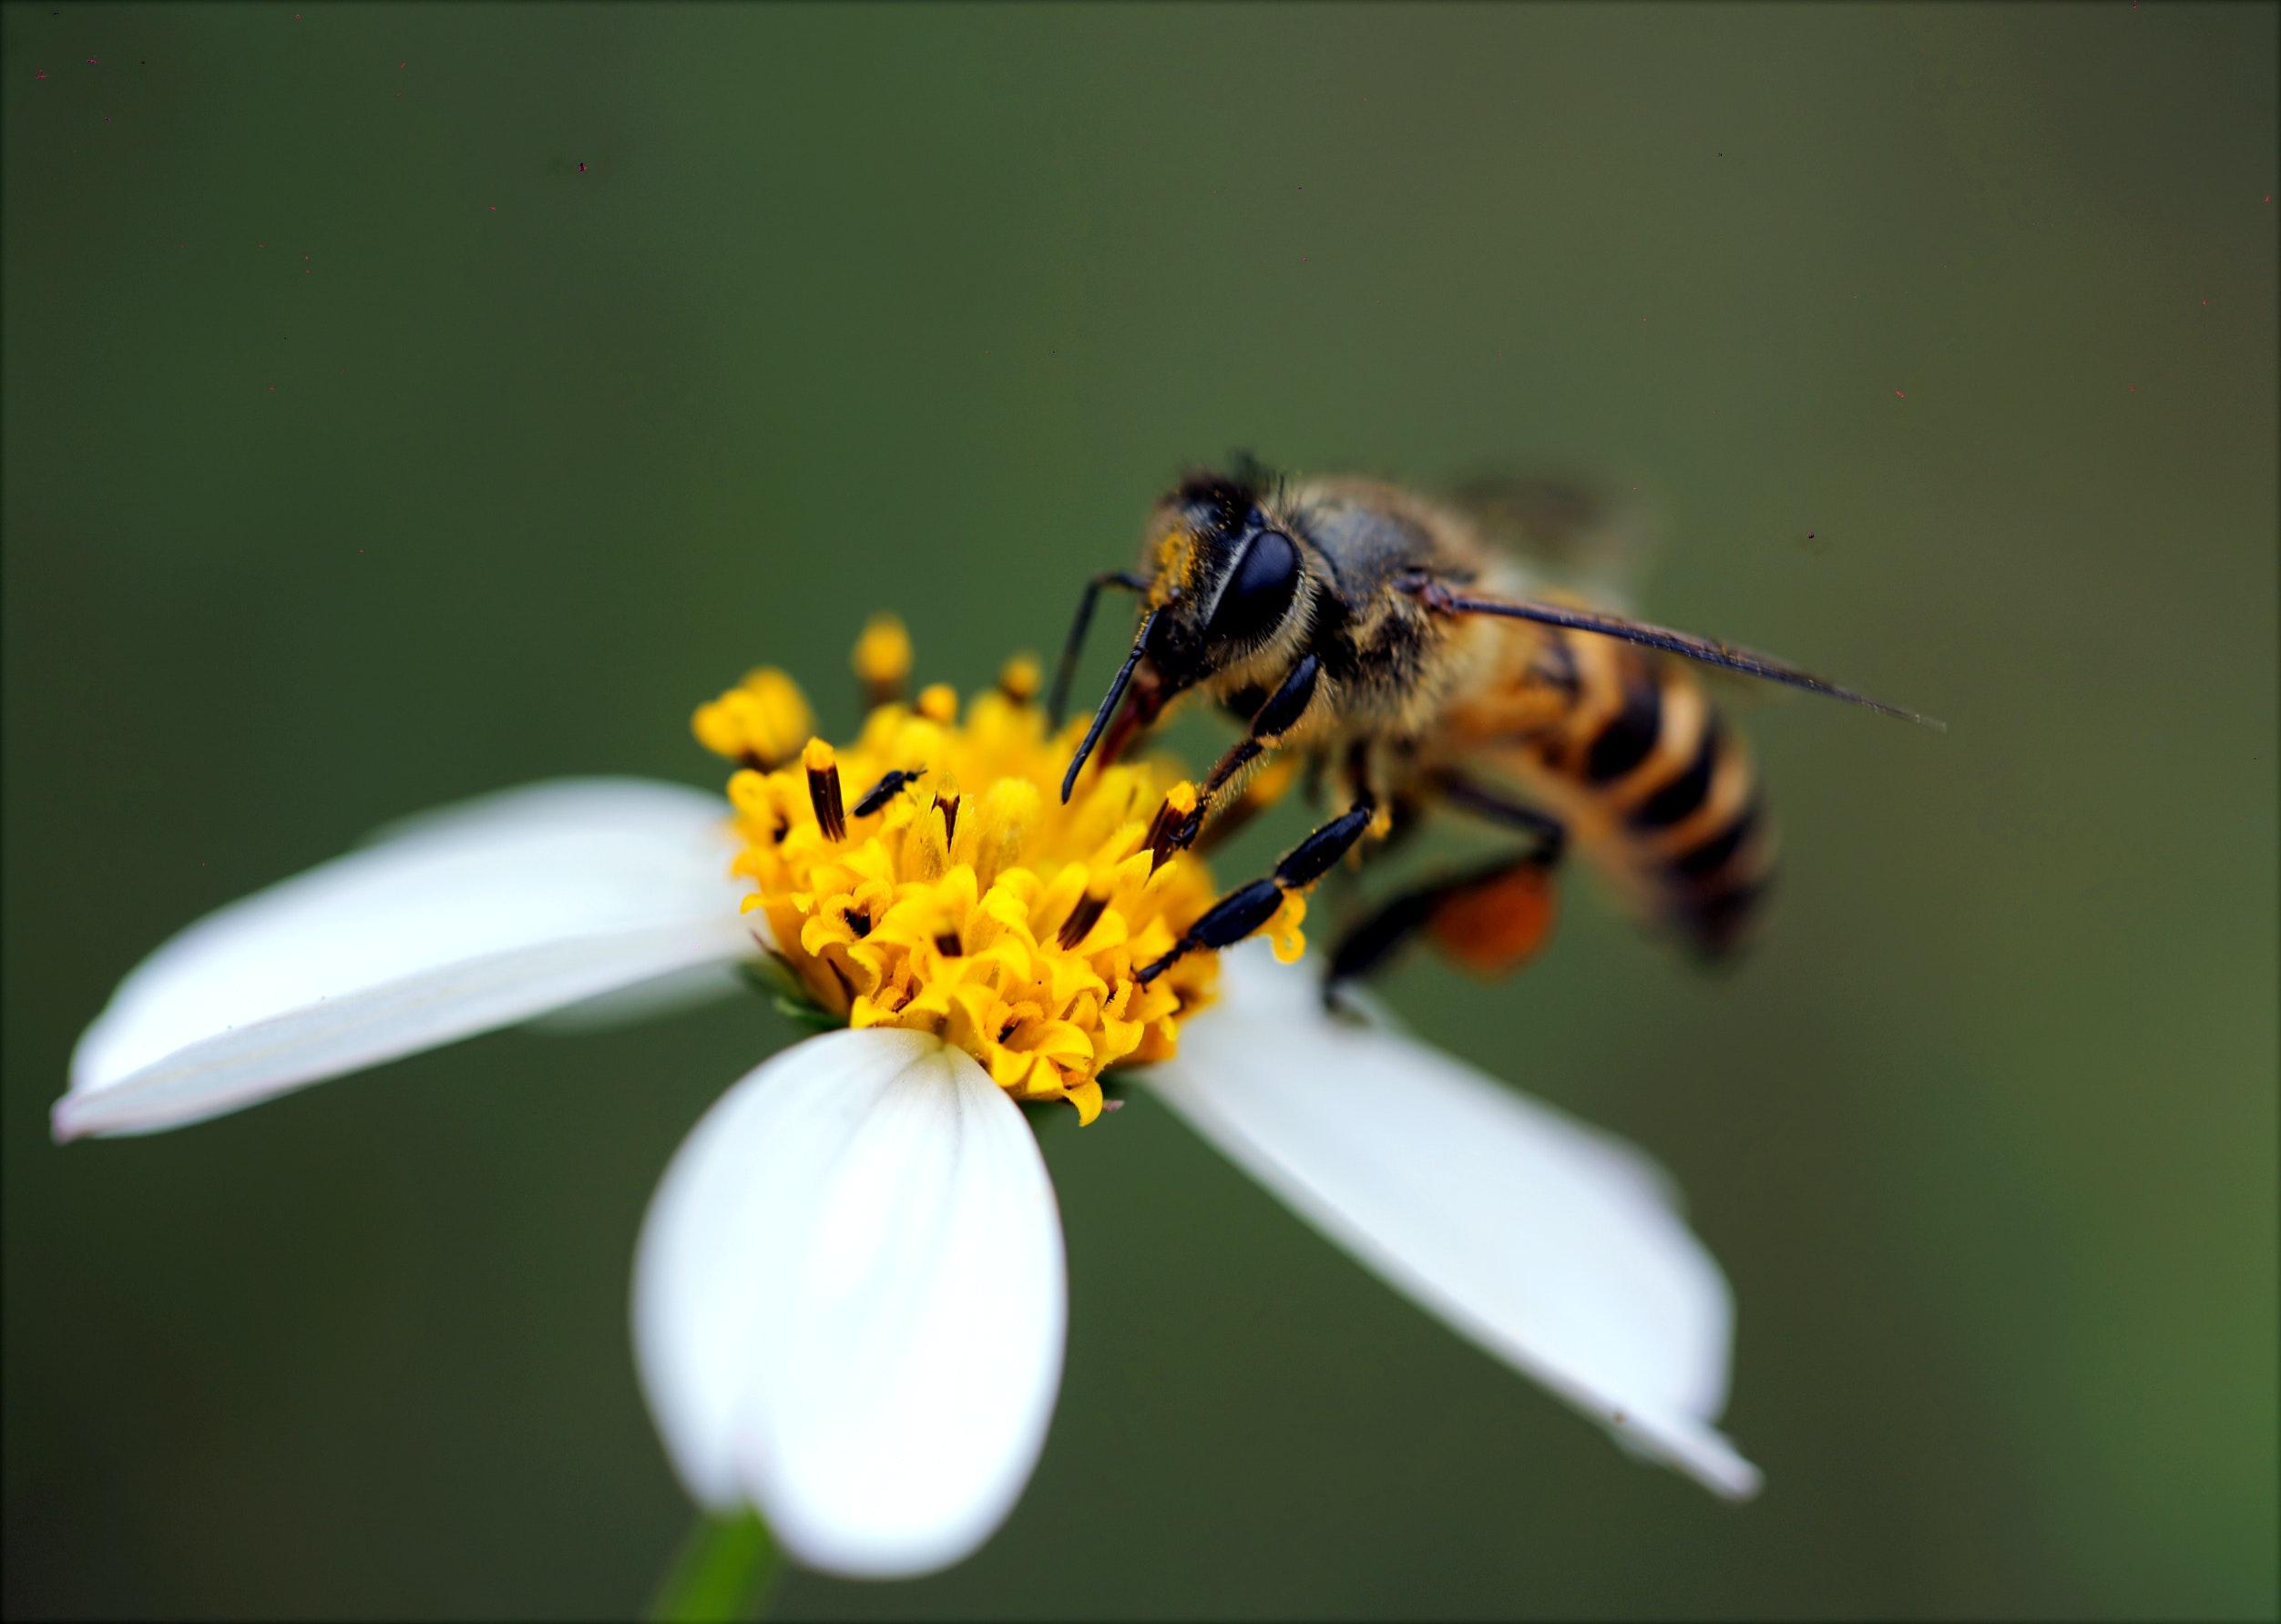 Bumble Bee on Yellow Daisy · Free Stock Photo